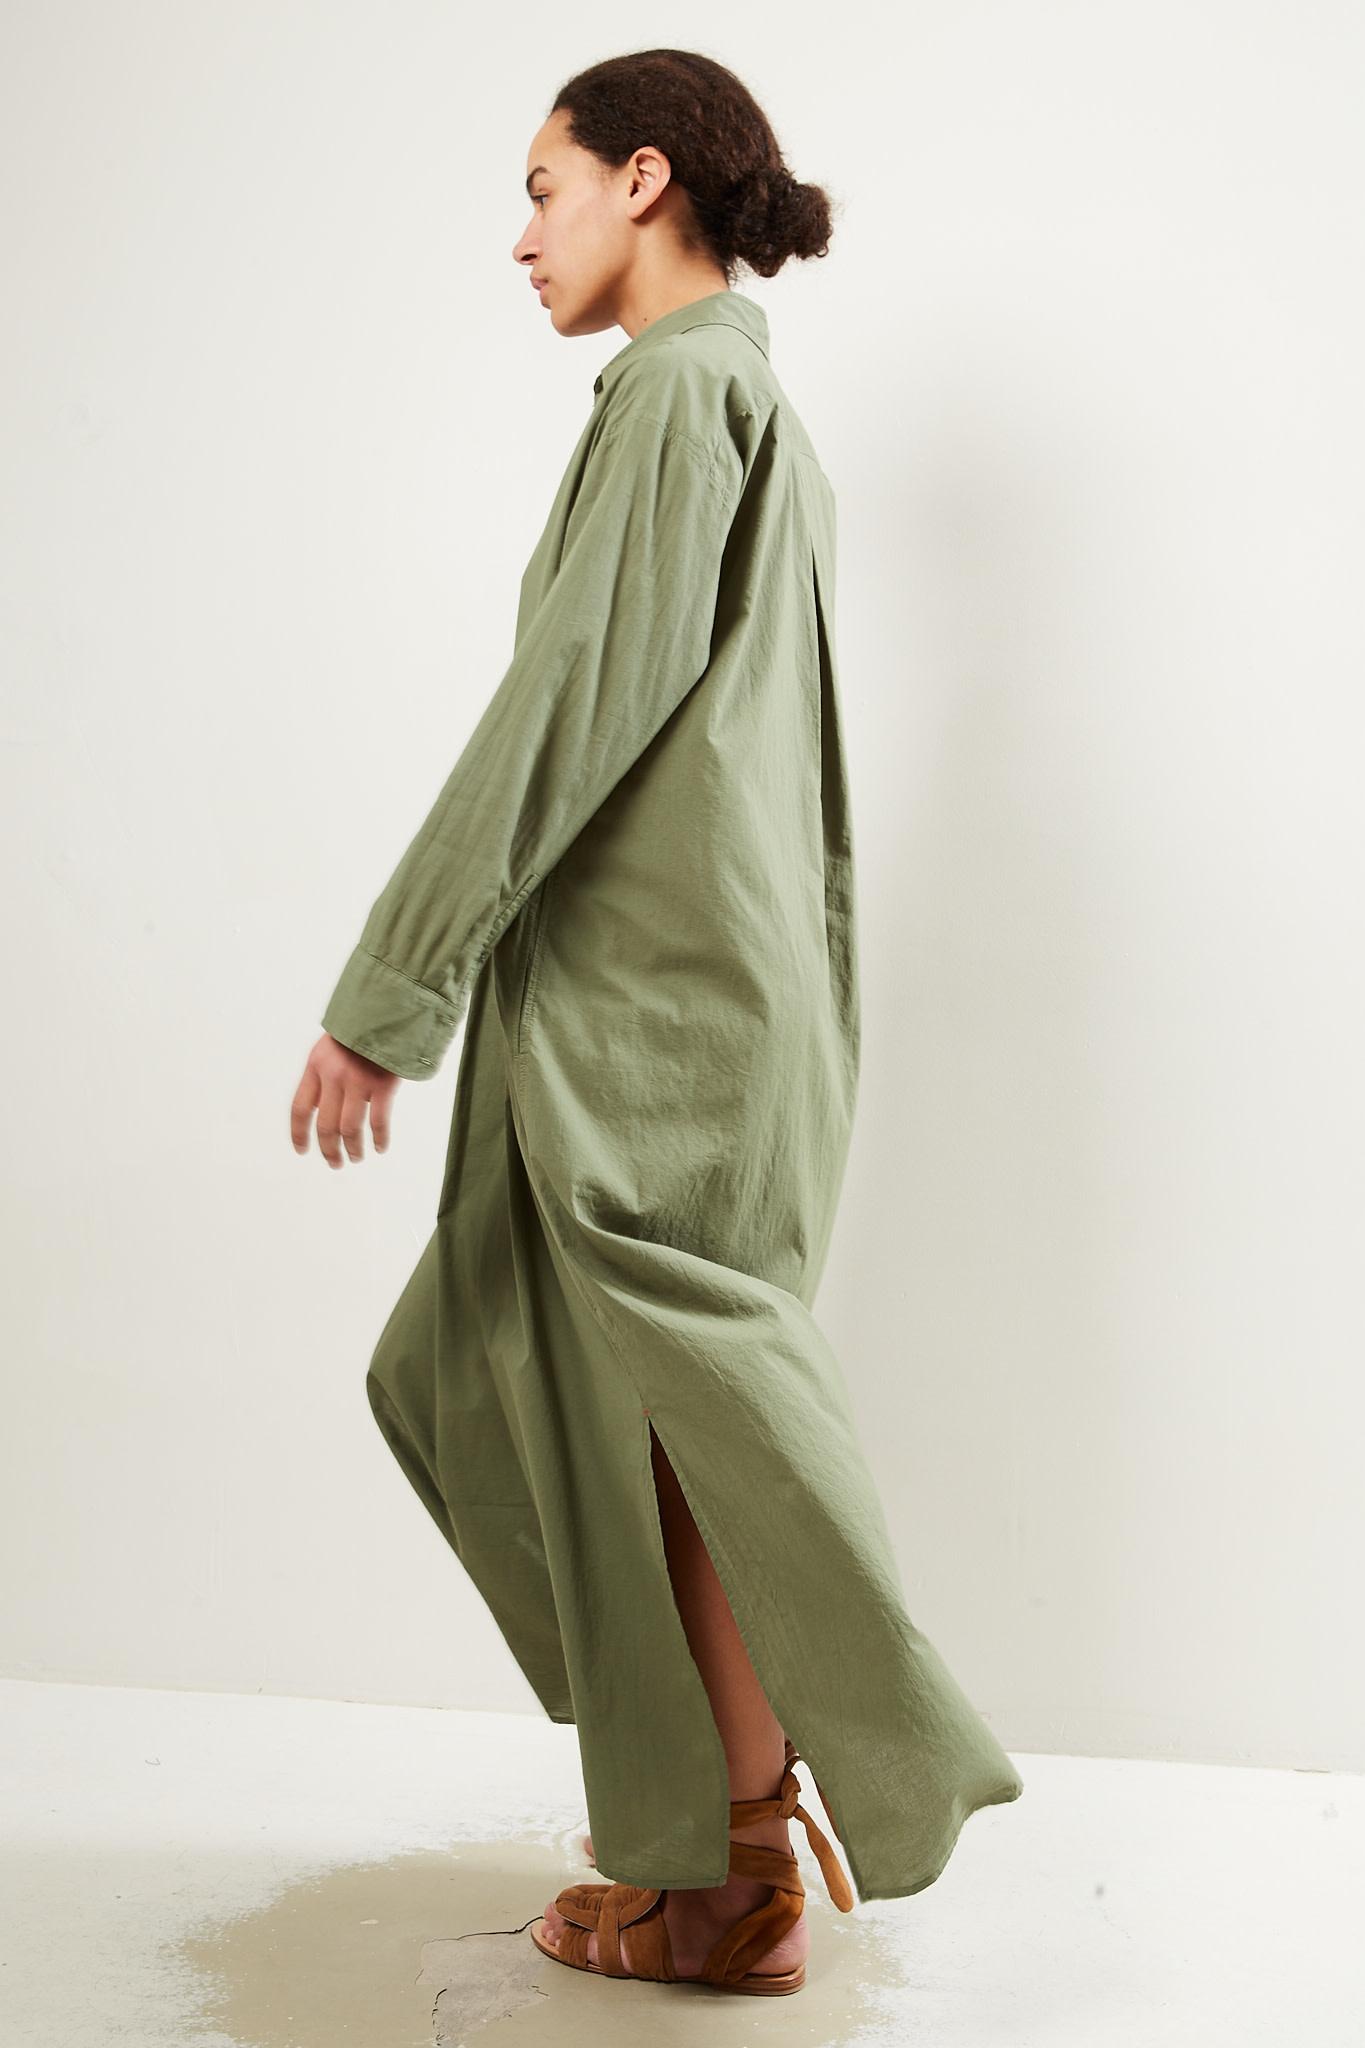 Xirena - Hope cotton poplin dress